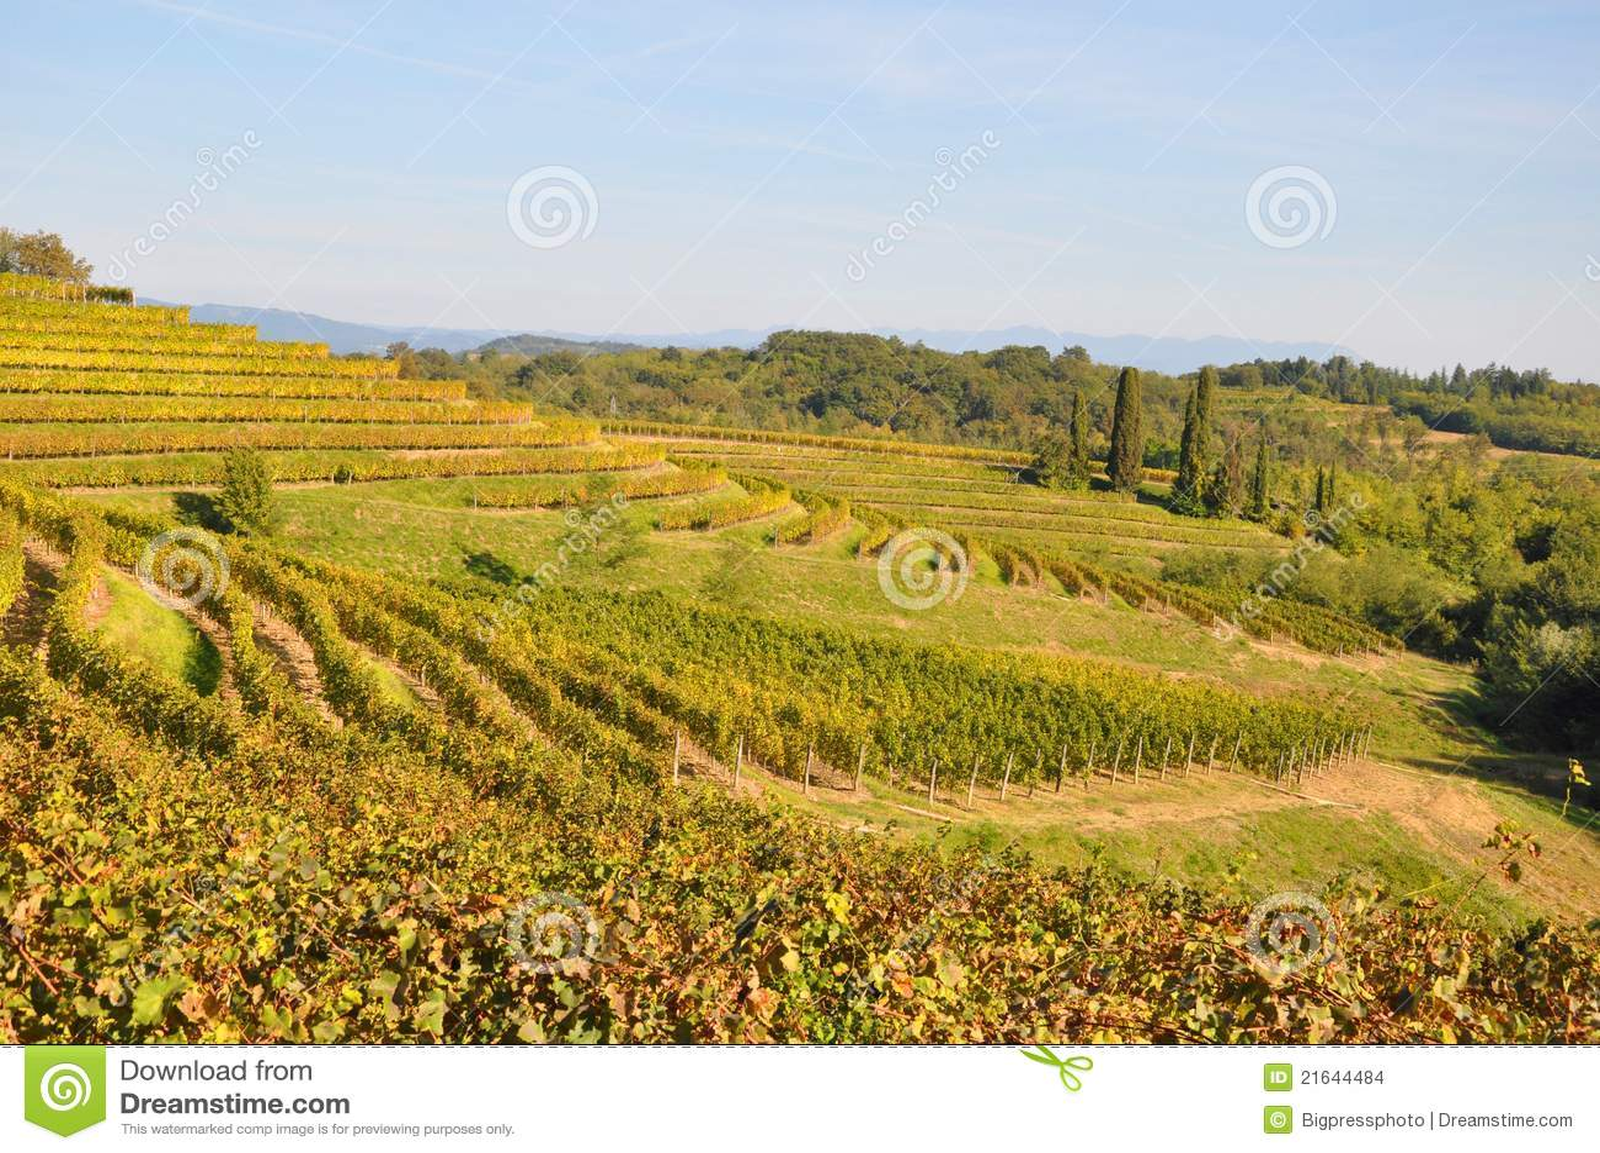 Adega e vinho italy